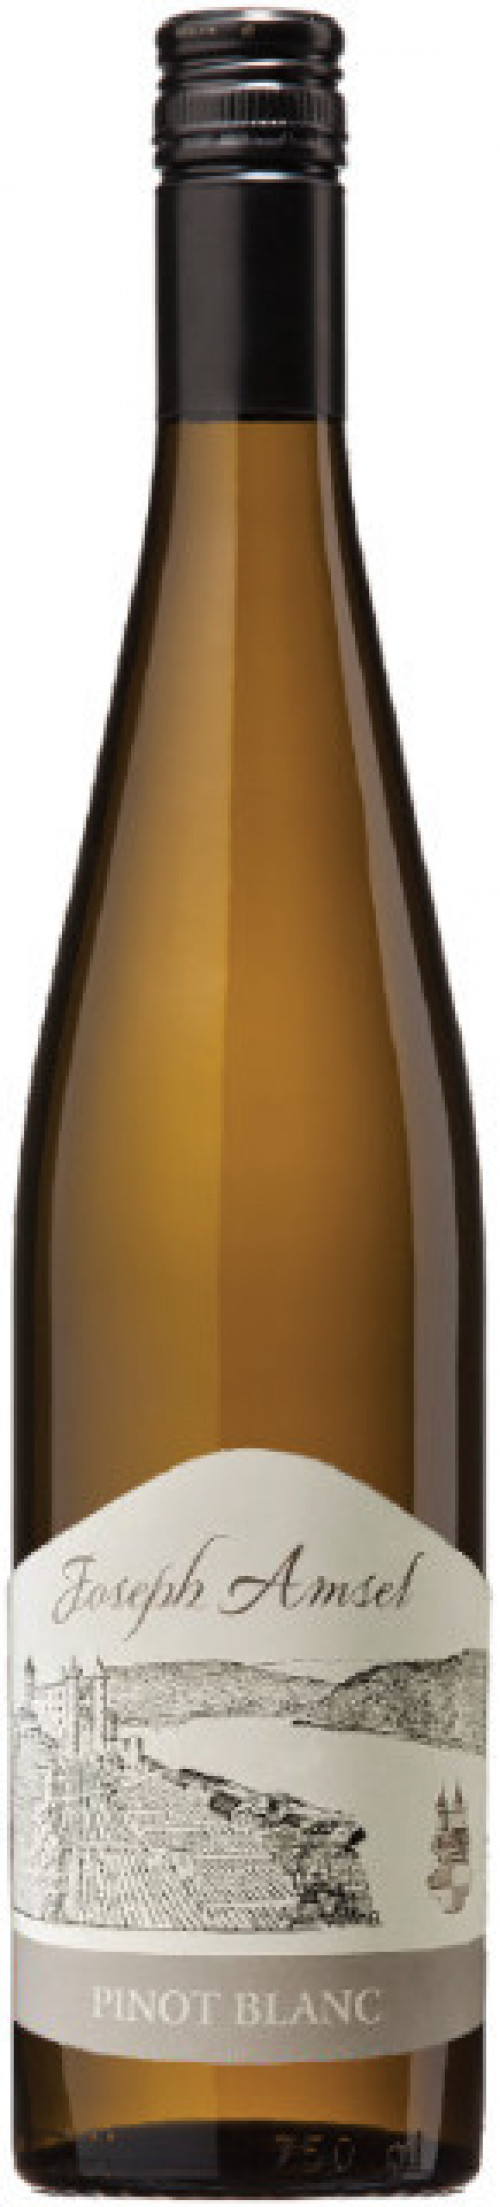 2019 Joseph Amsel Pinot Blanc 750ml